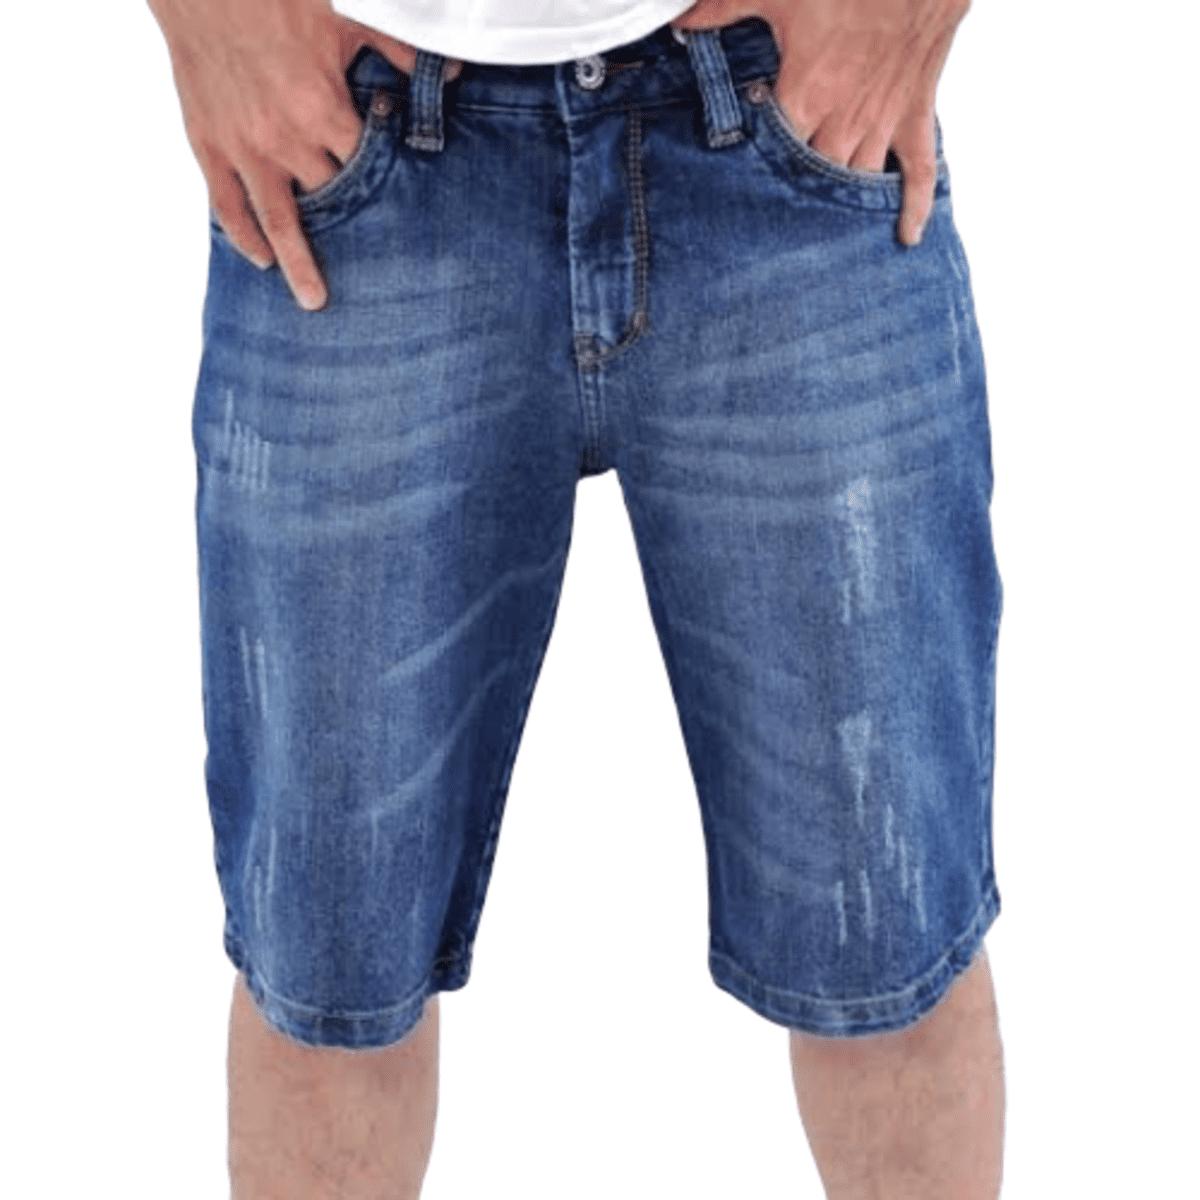 Kit 2 Bermuda Short Jeans Masculina Atacado Revenda E Lucre